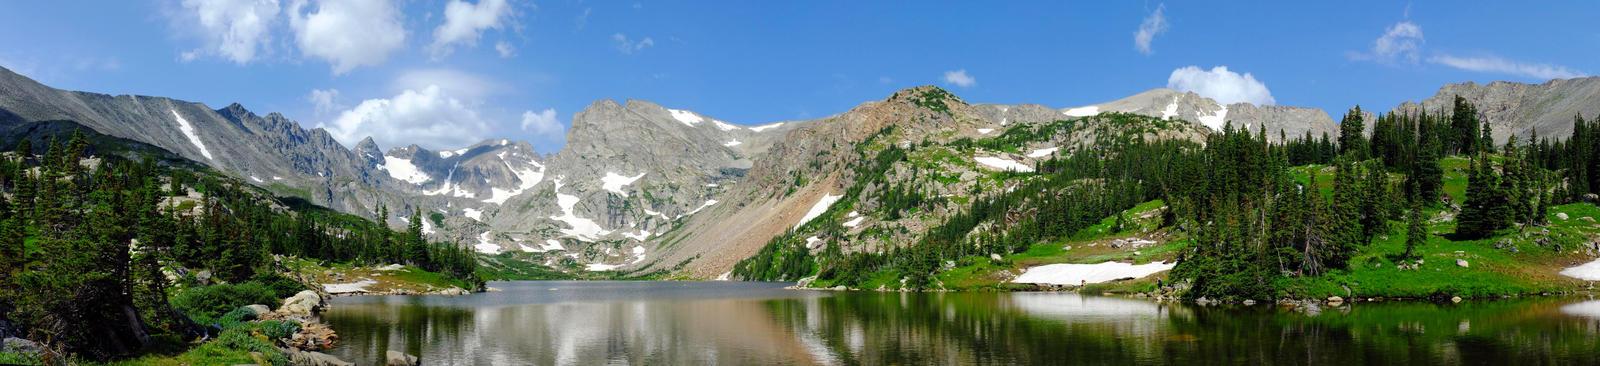 Mid summer at Indian Peaks by Kolnithur